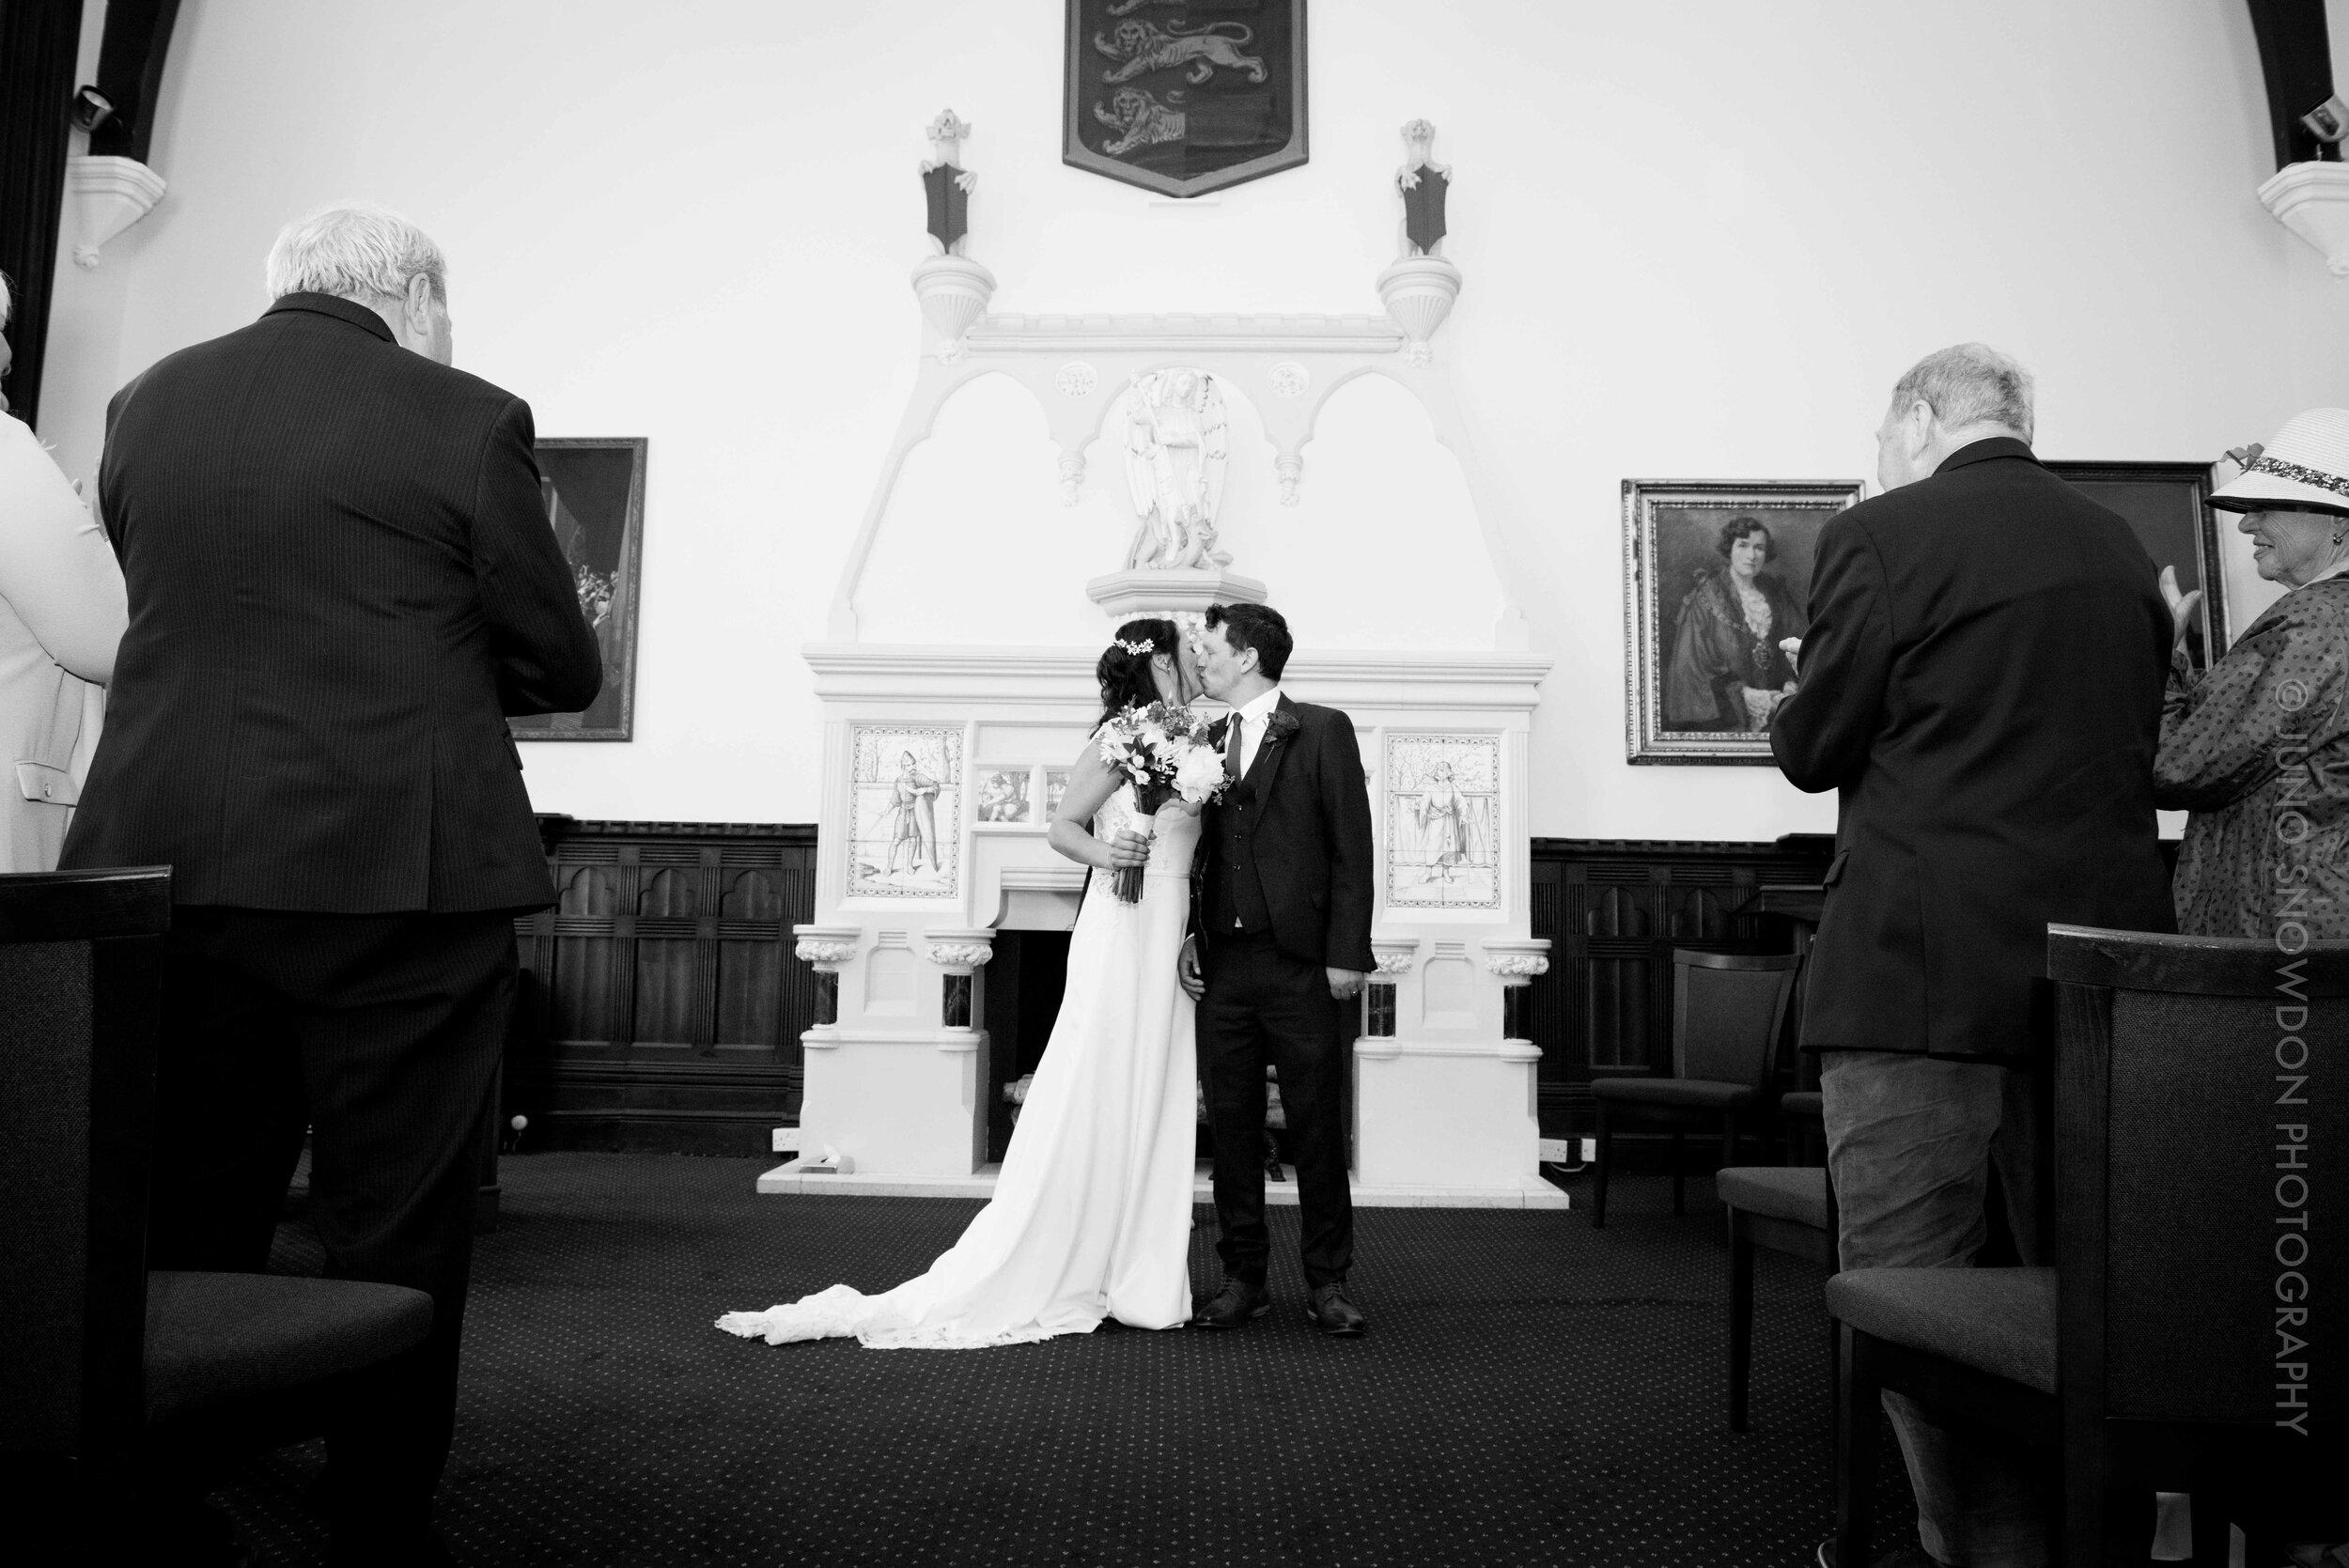 juno-snowdon-photography-wedding-7356.jpg